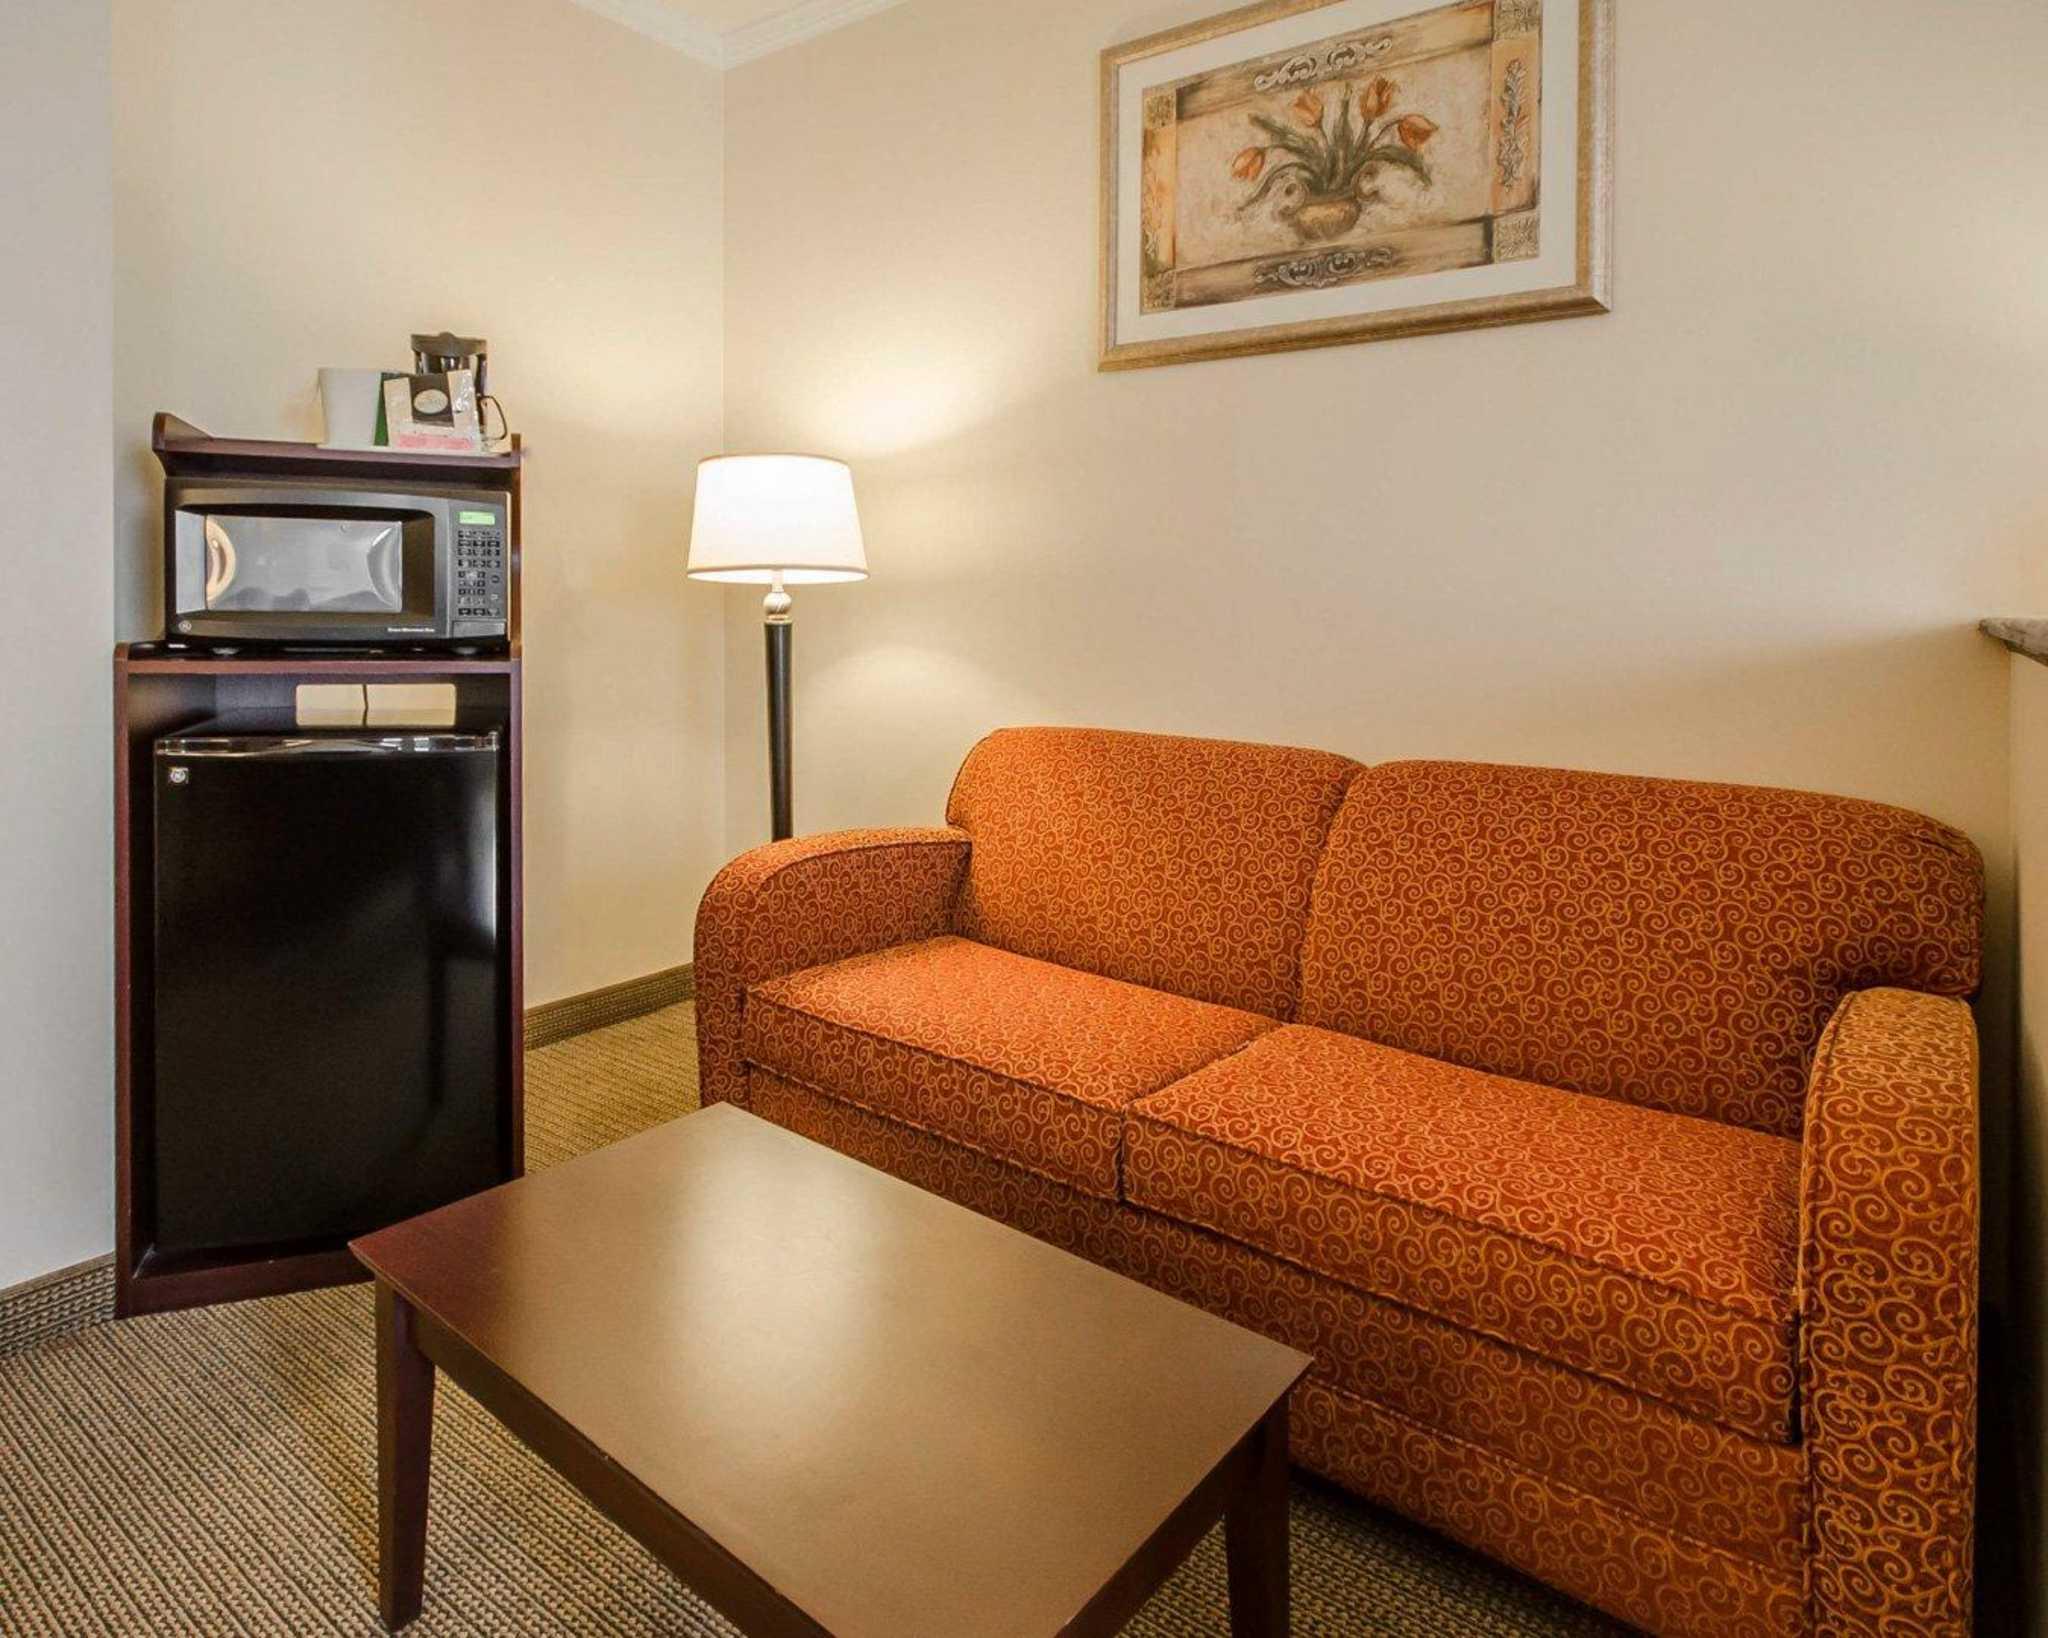 Quality Suites image 4